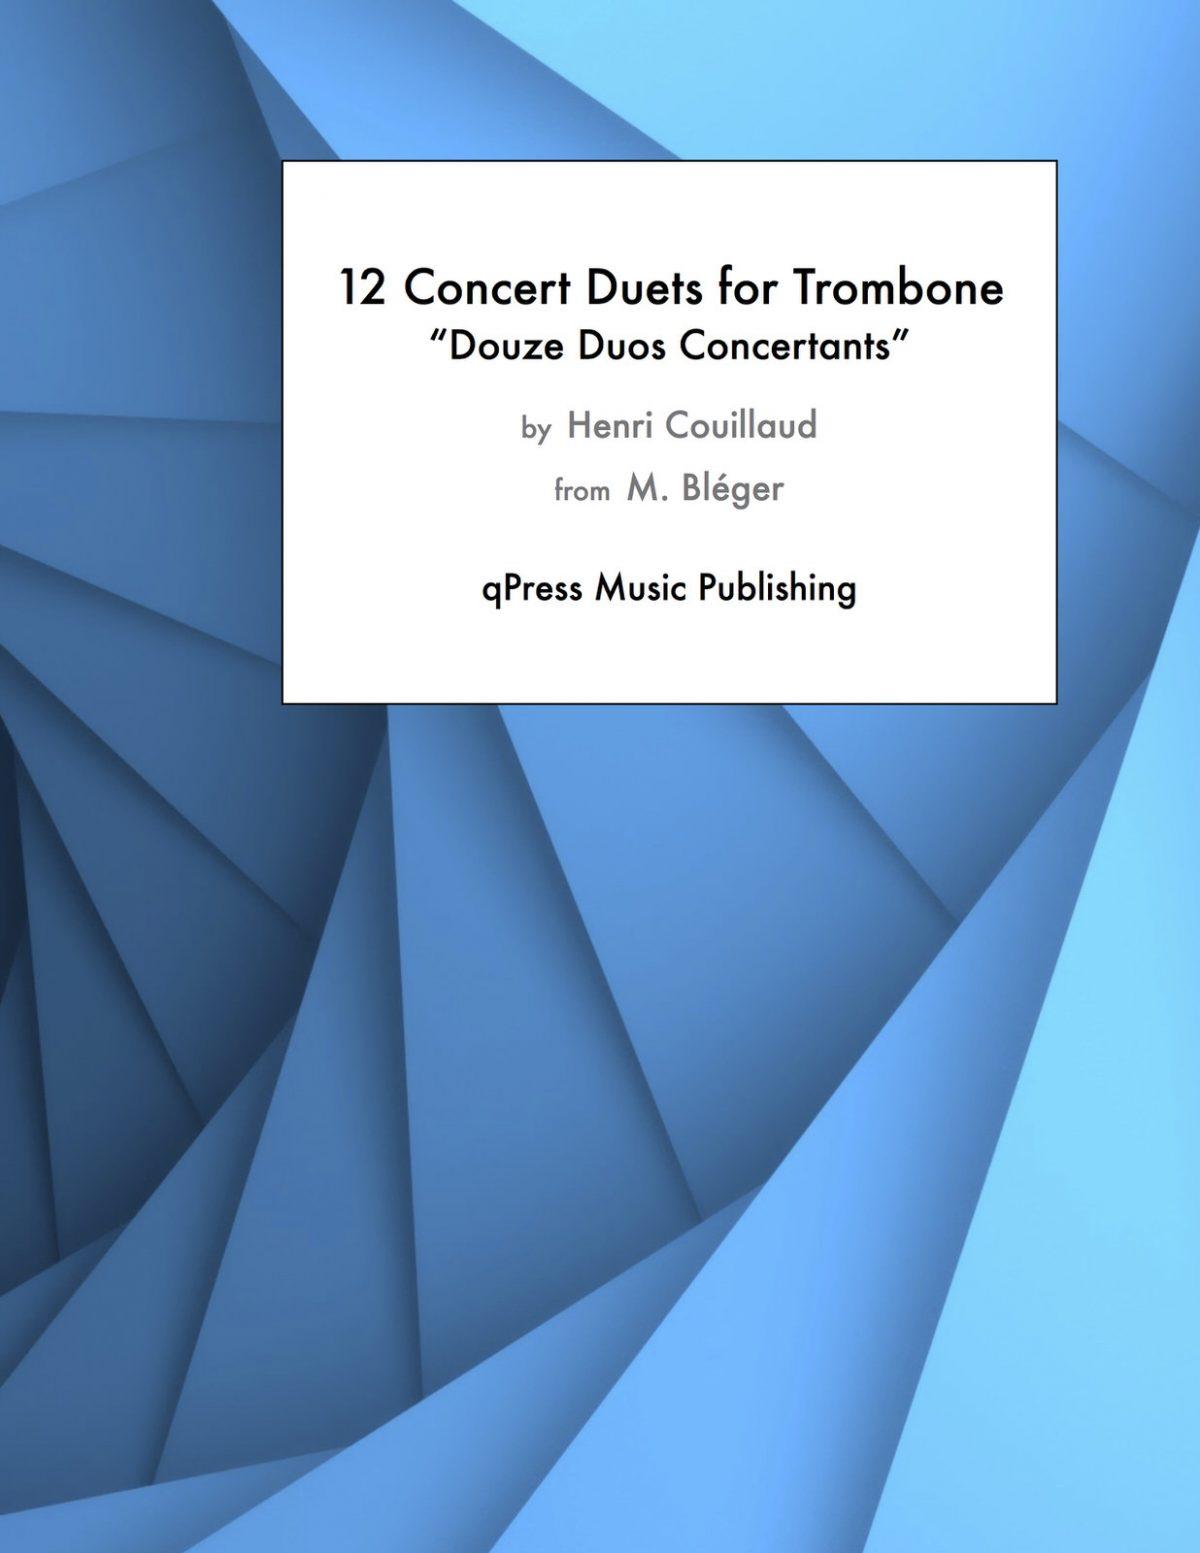 Couillaud, Douze Duos Concertants